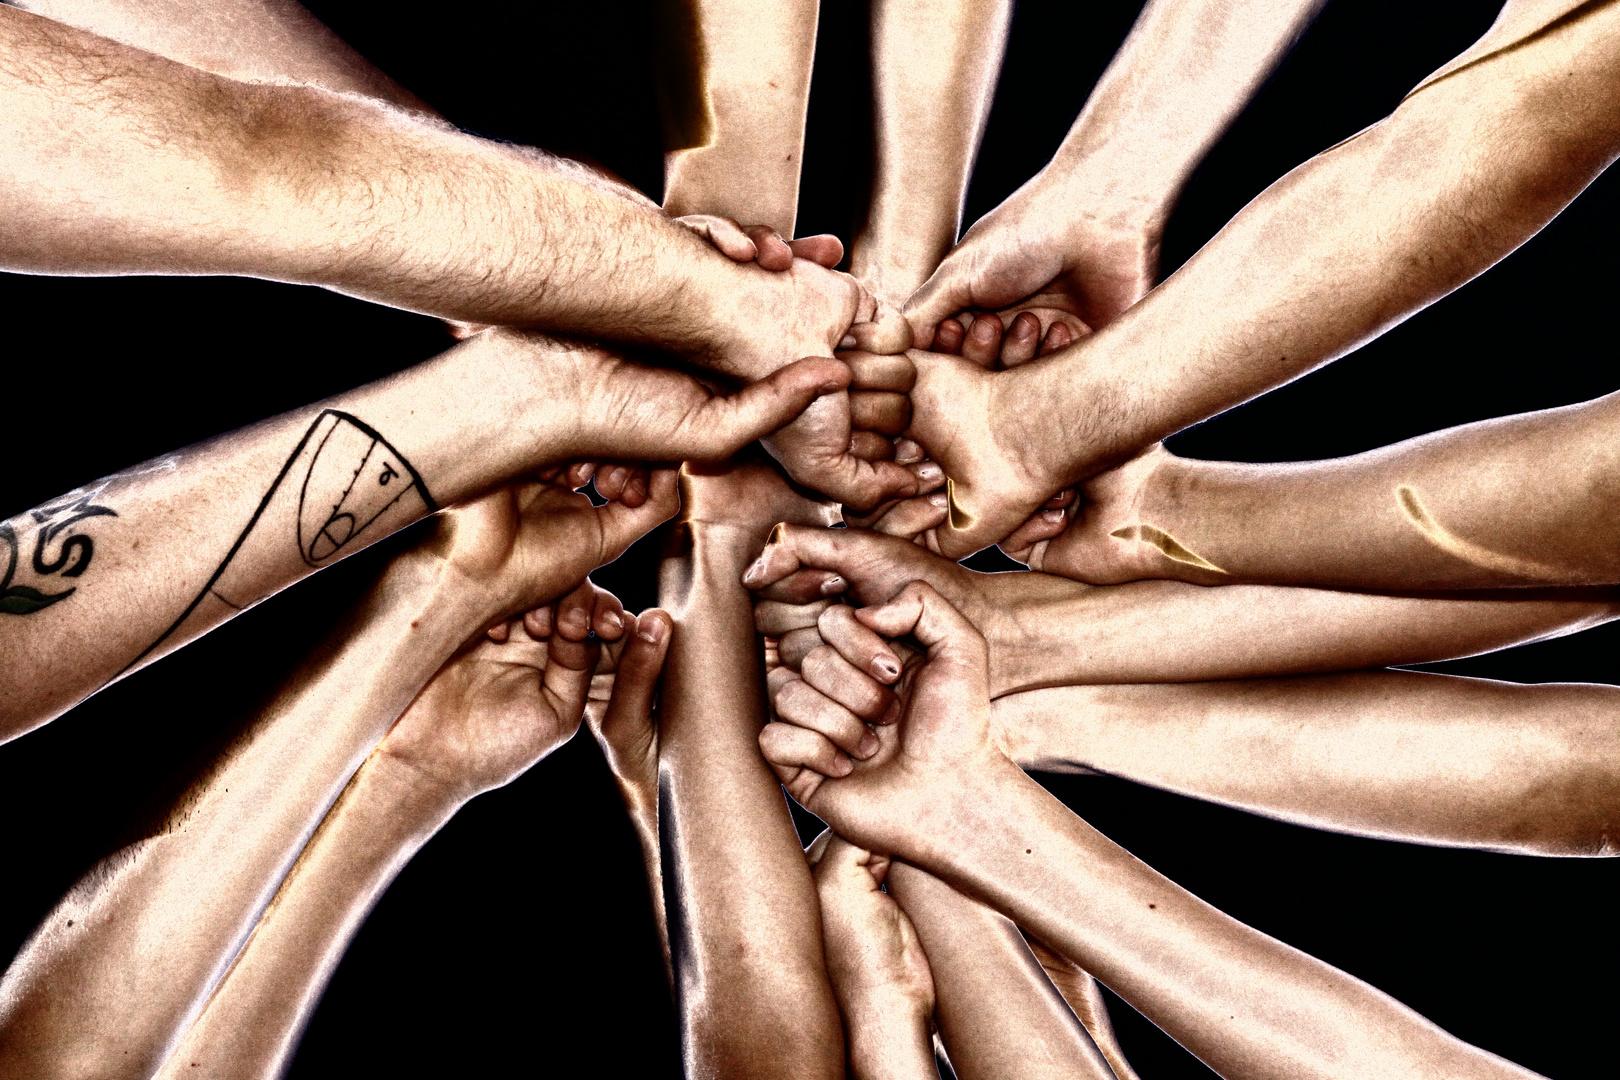 ...one team...